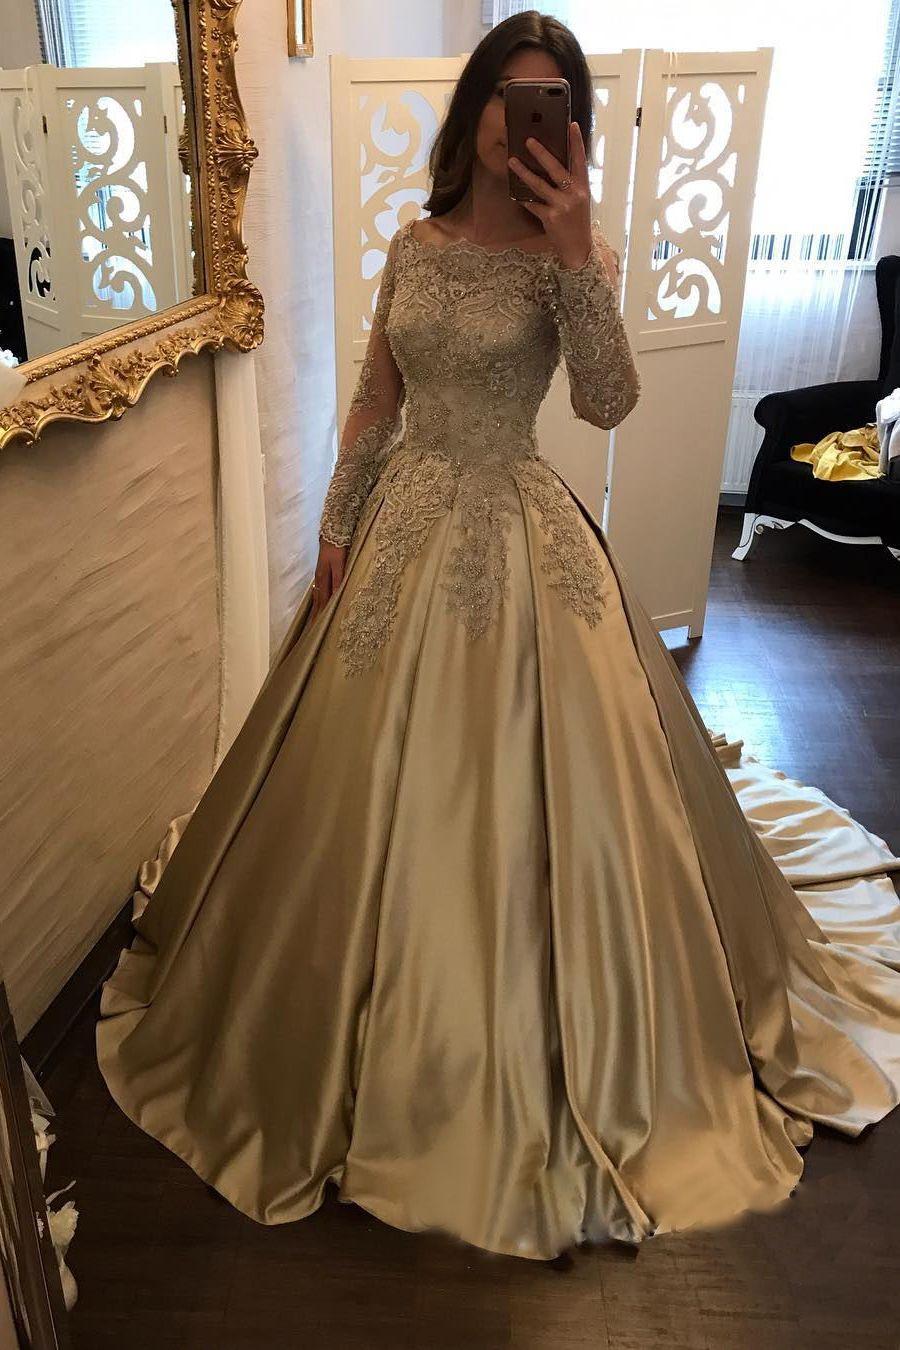 Satin prom dressball gown prom dresslong sleeve bridal gownslace